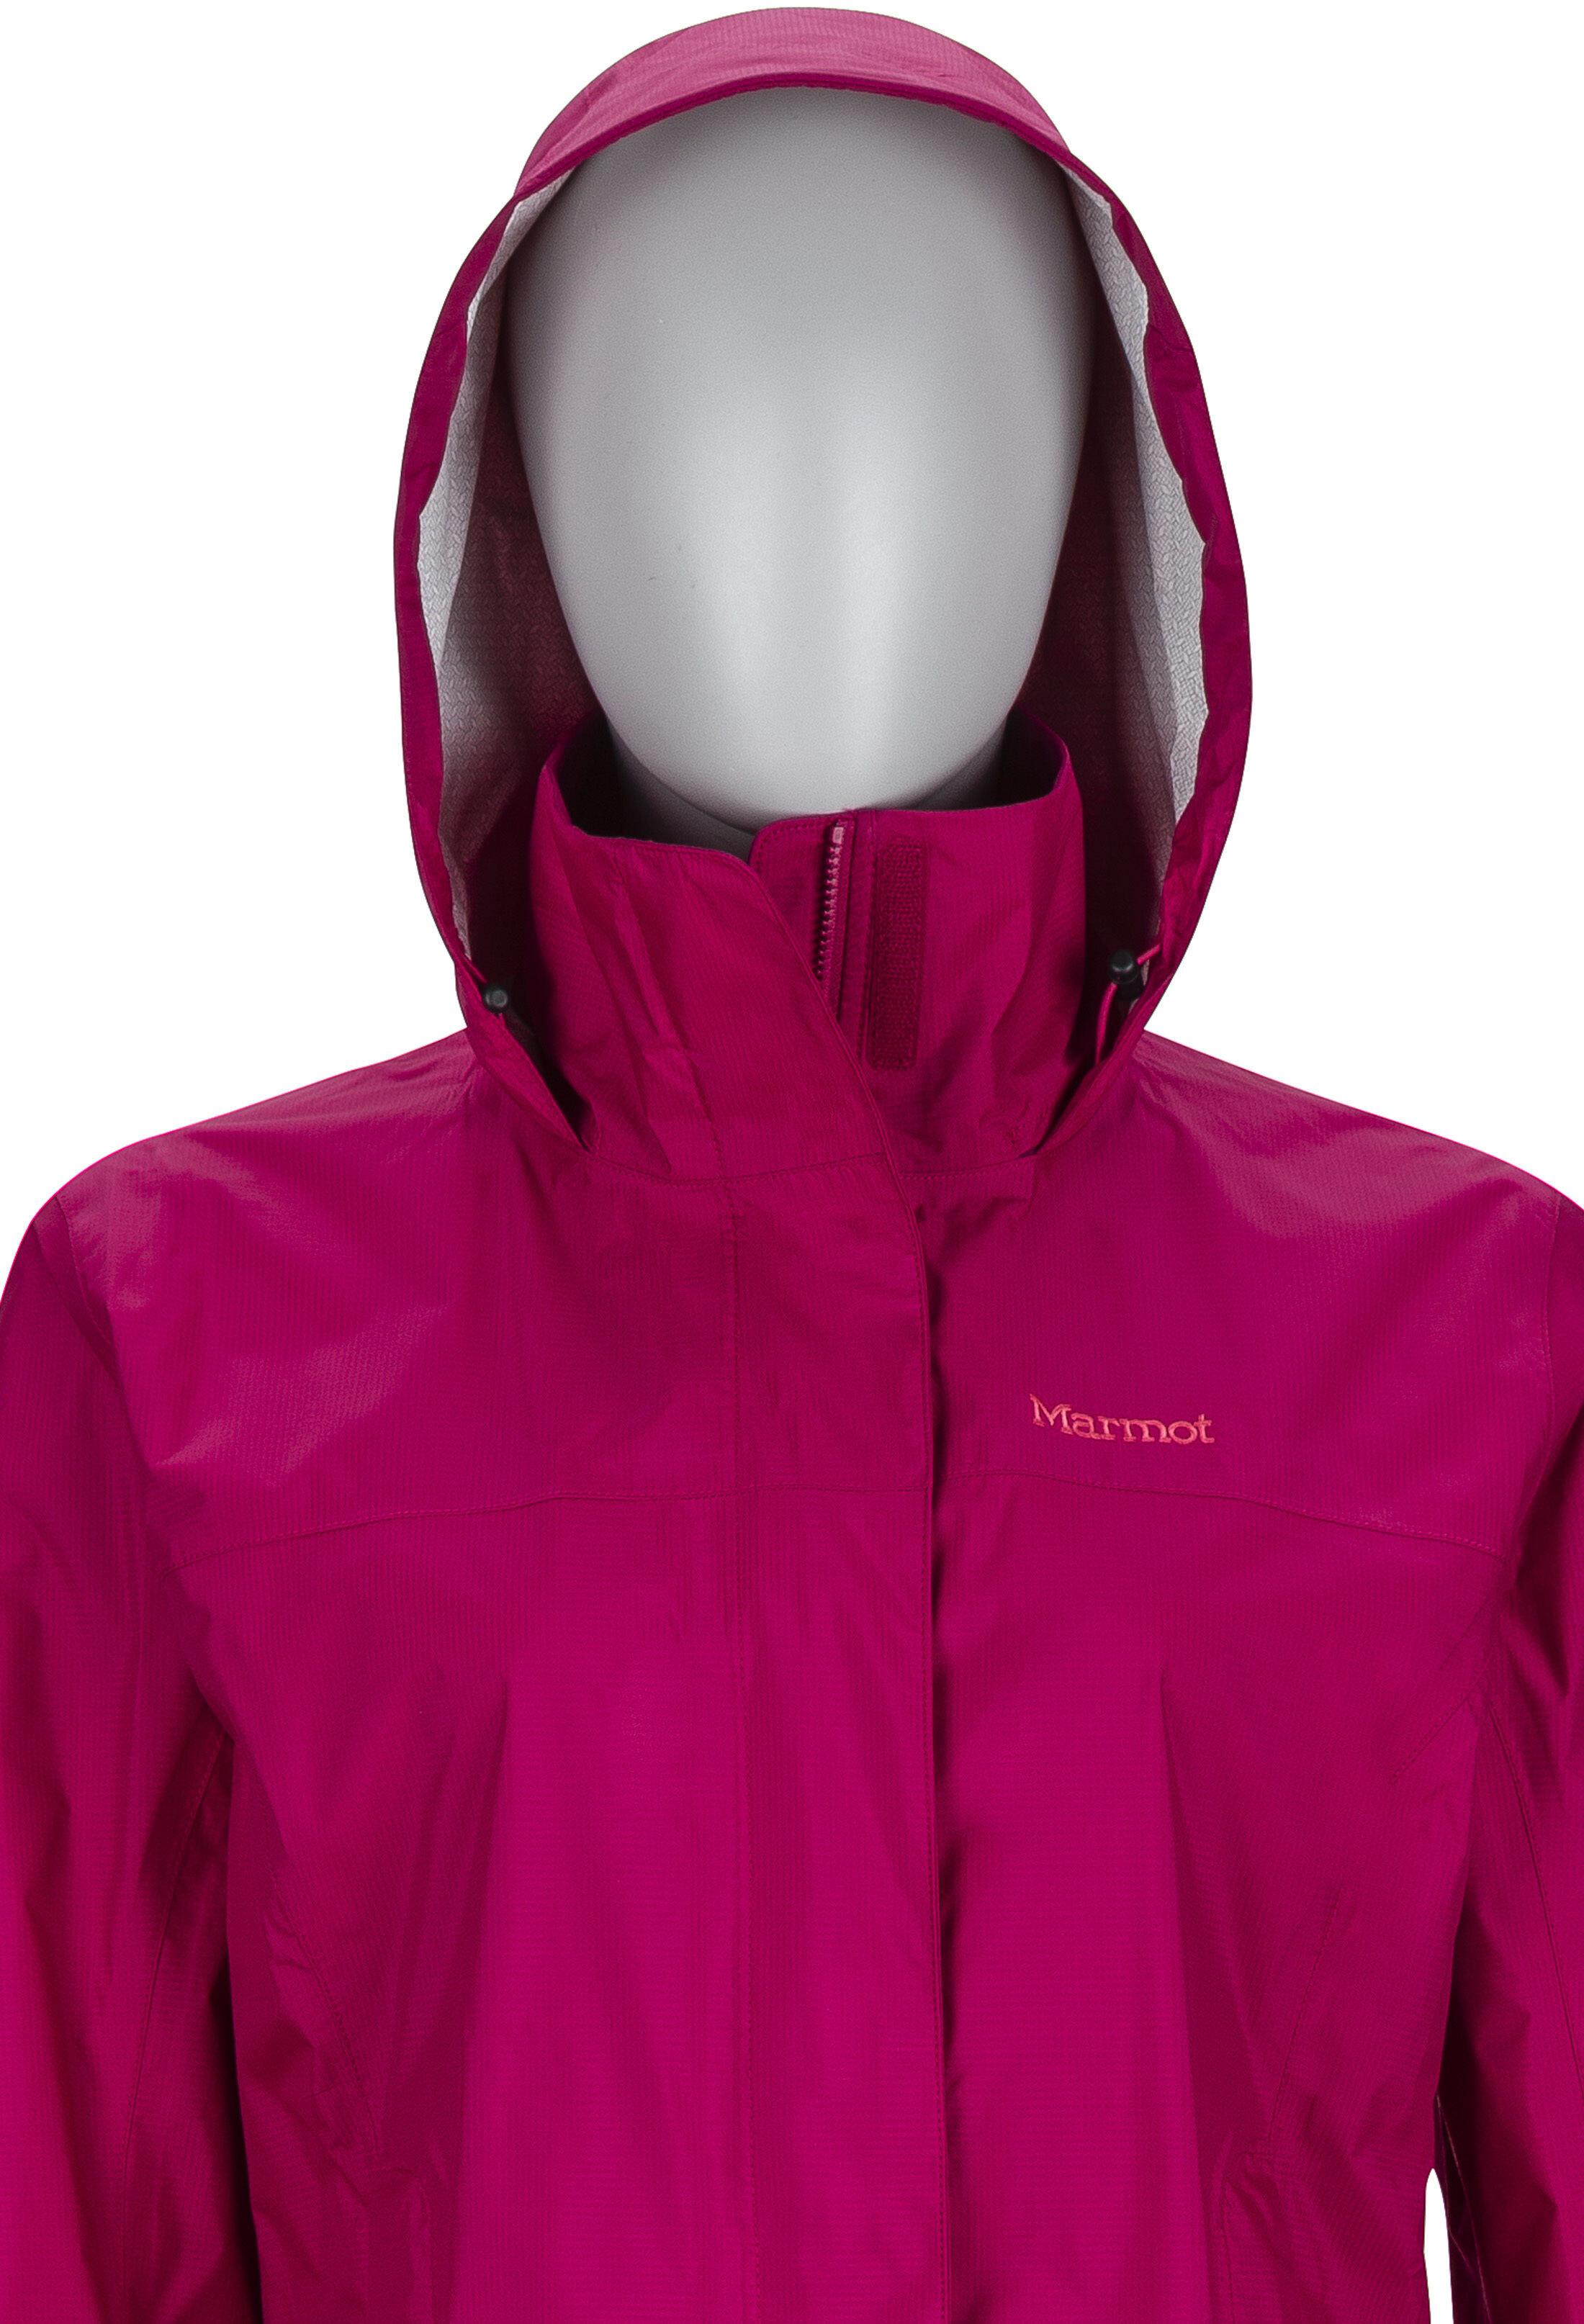 Marmot Women S Alexie Jacket: Marmot PreCip Jacket Women Pink At Addnature.co.uk